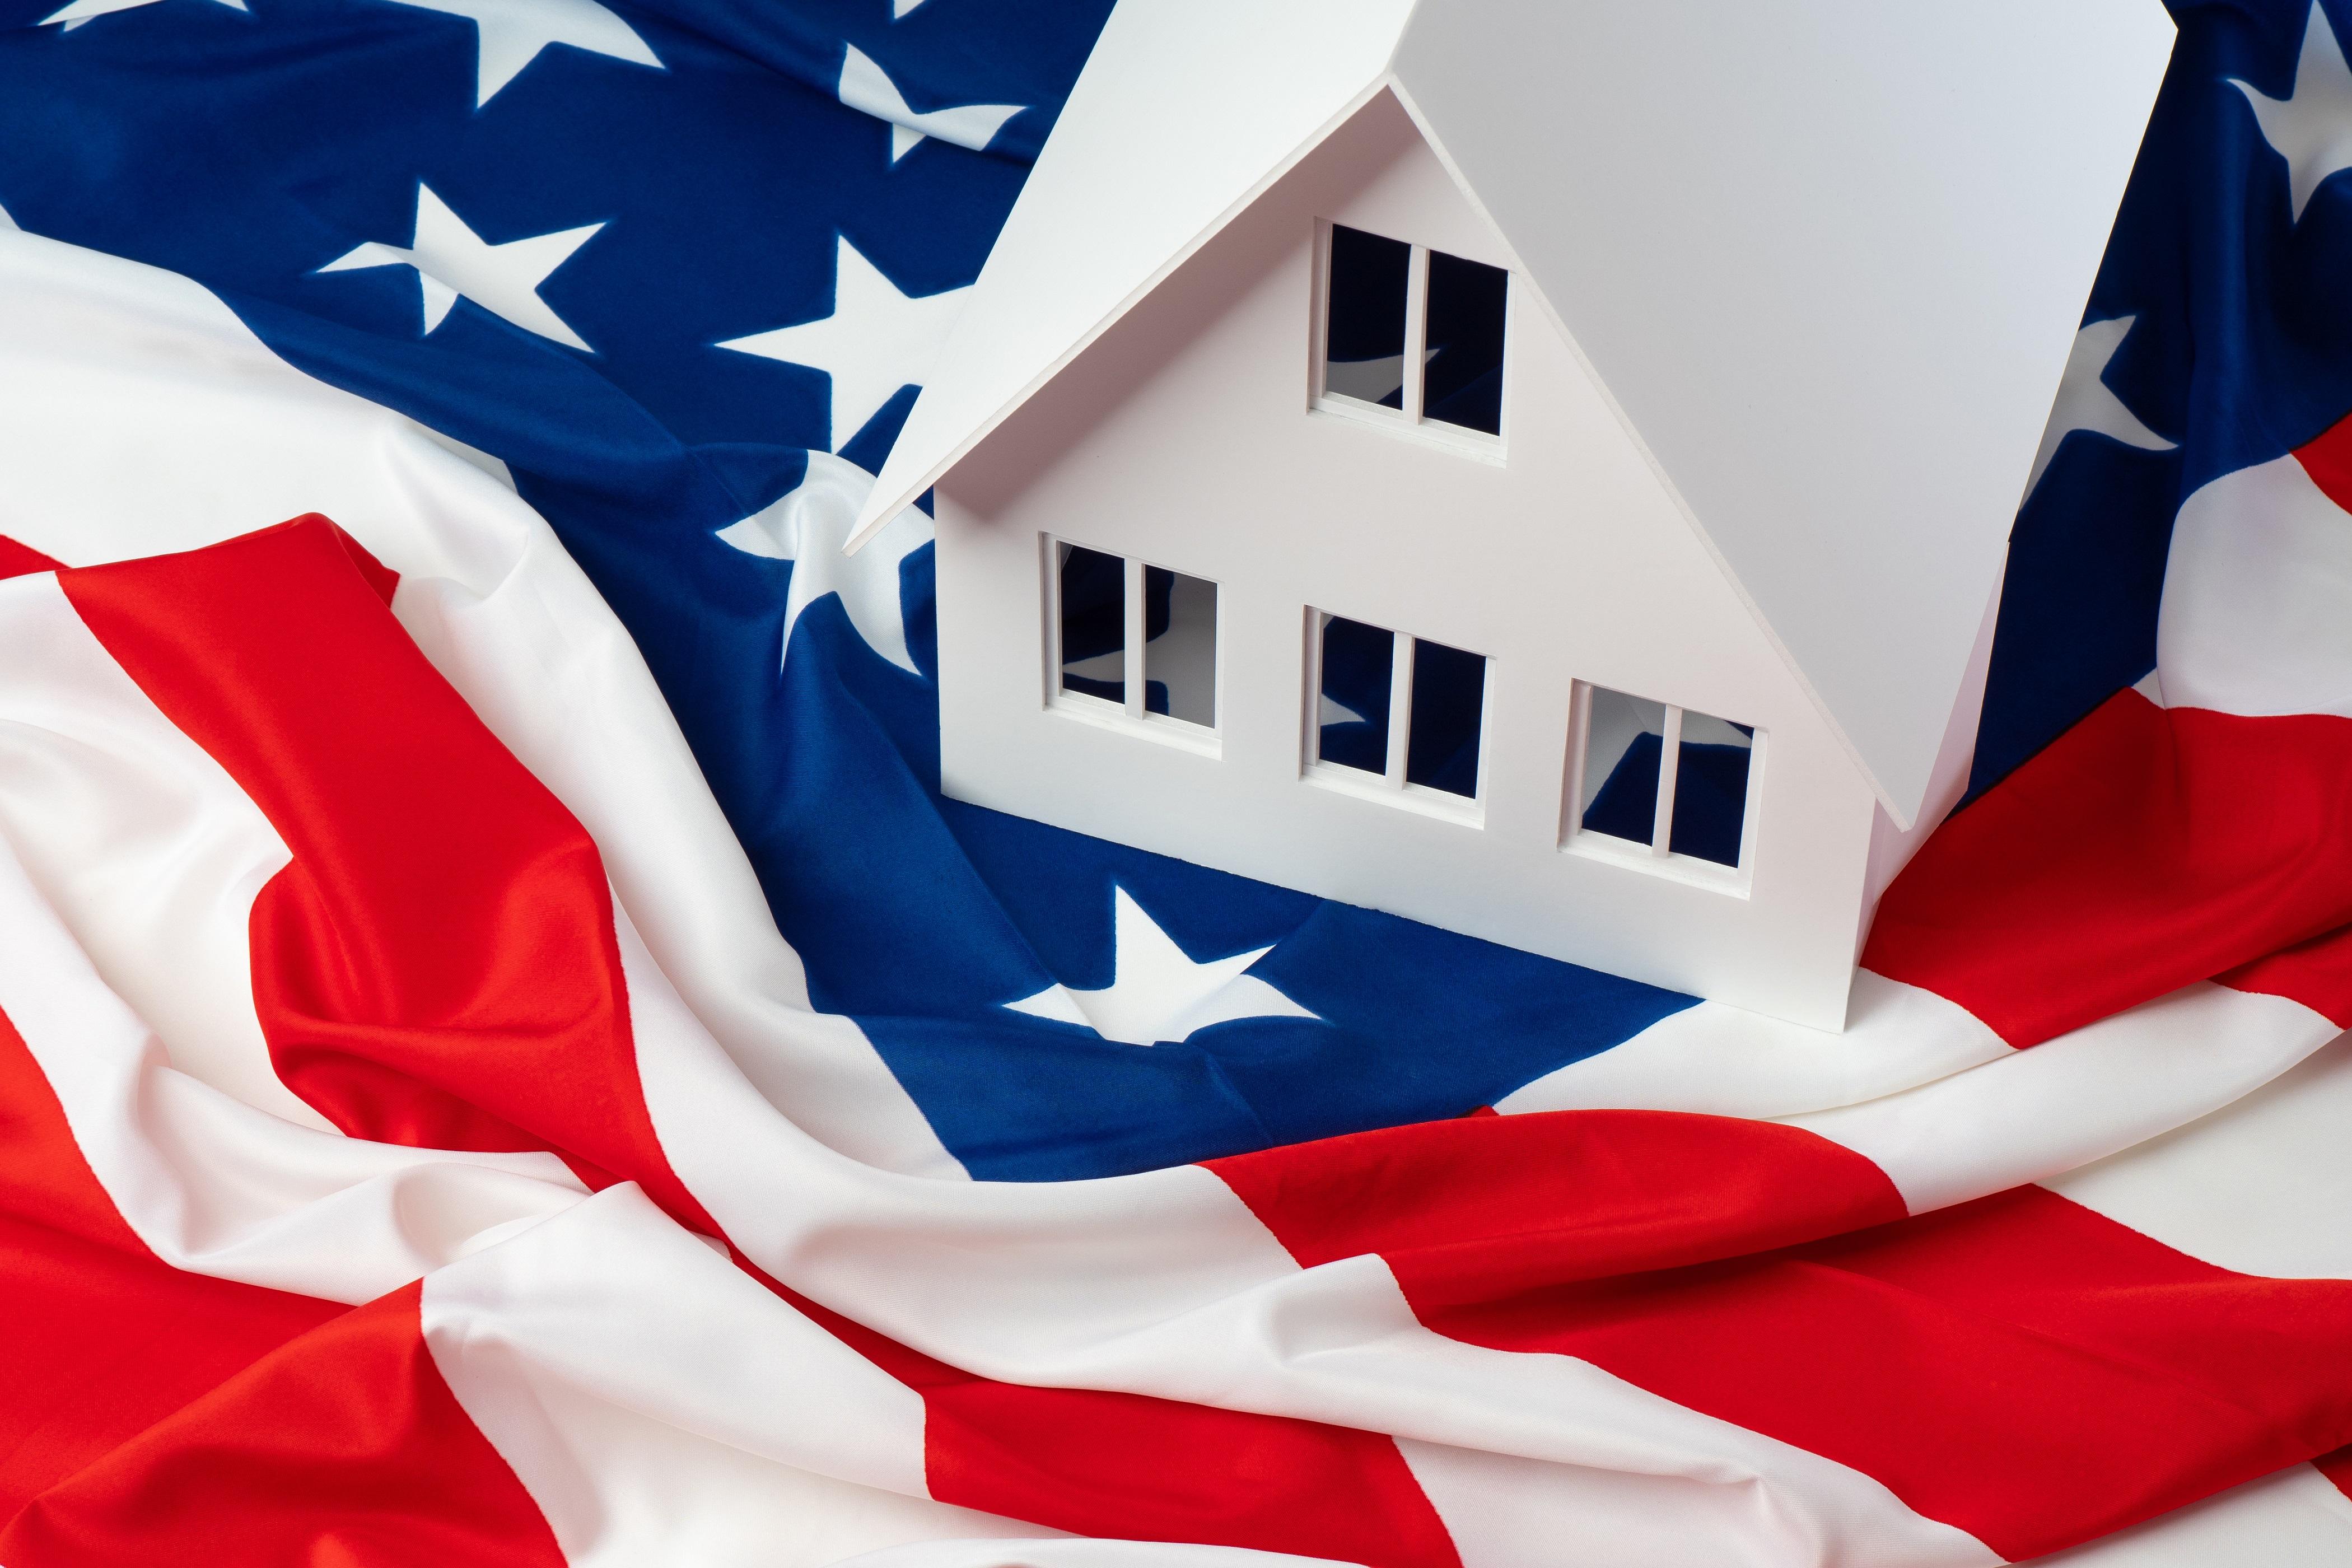 White House on American Flag